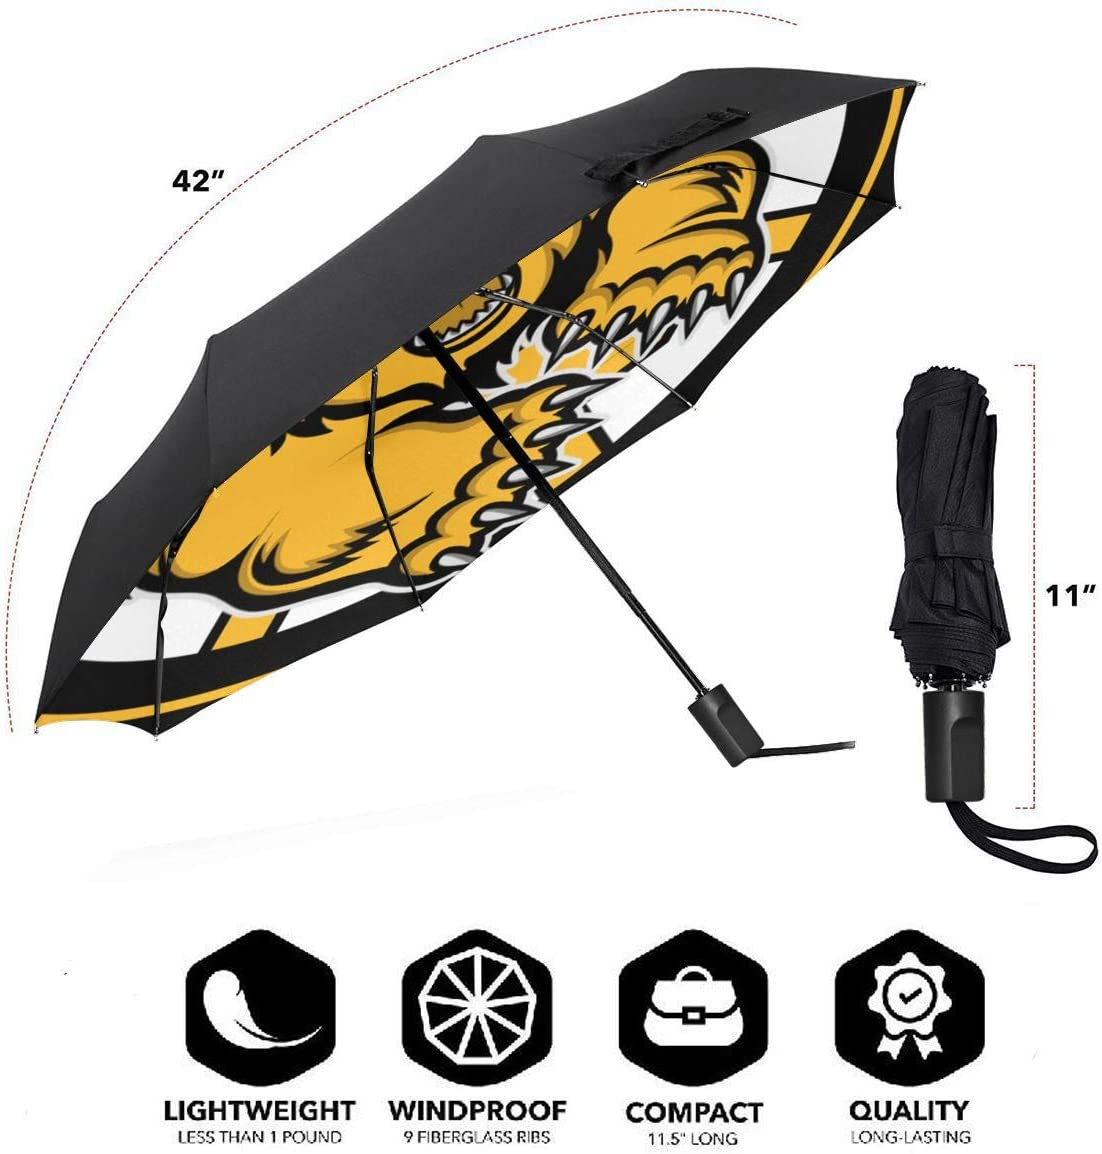 Bos-ton B-Ruins Compact Folding Business Umbrellas UV Protection Manual Tri-fold Umbrella for Men and Women Lovesofun Portable Manual Umbrella